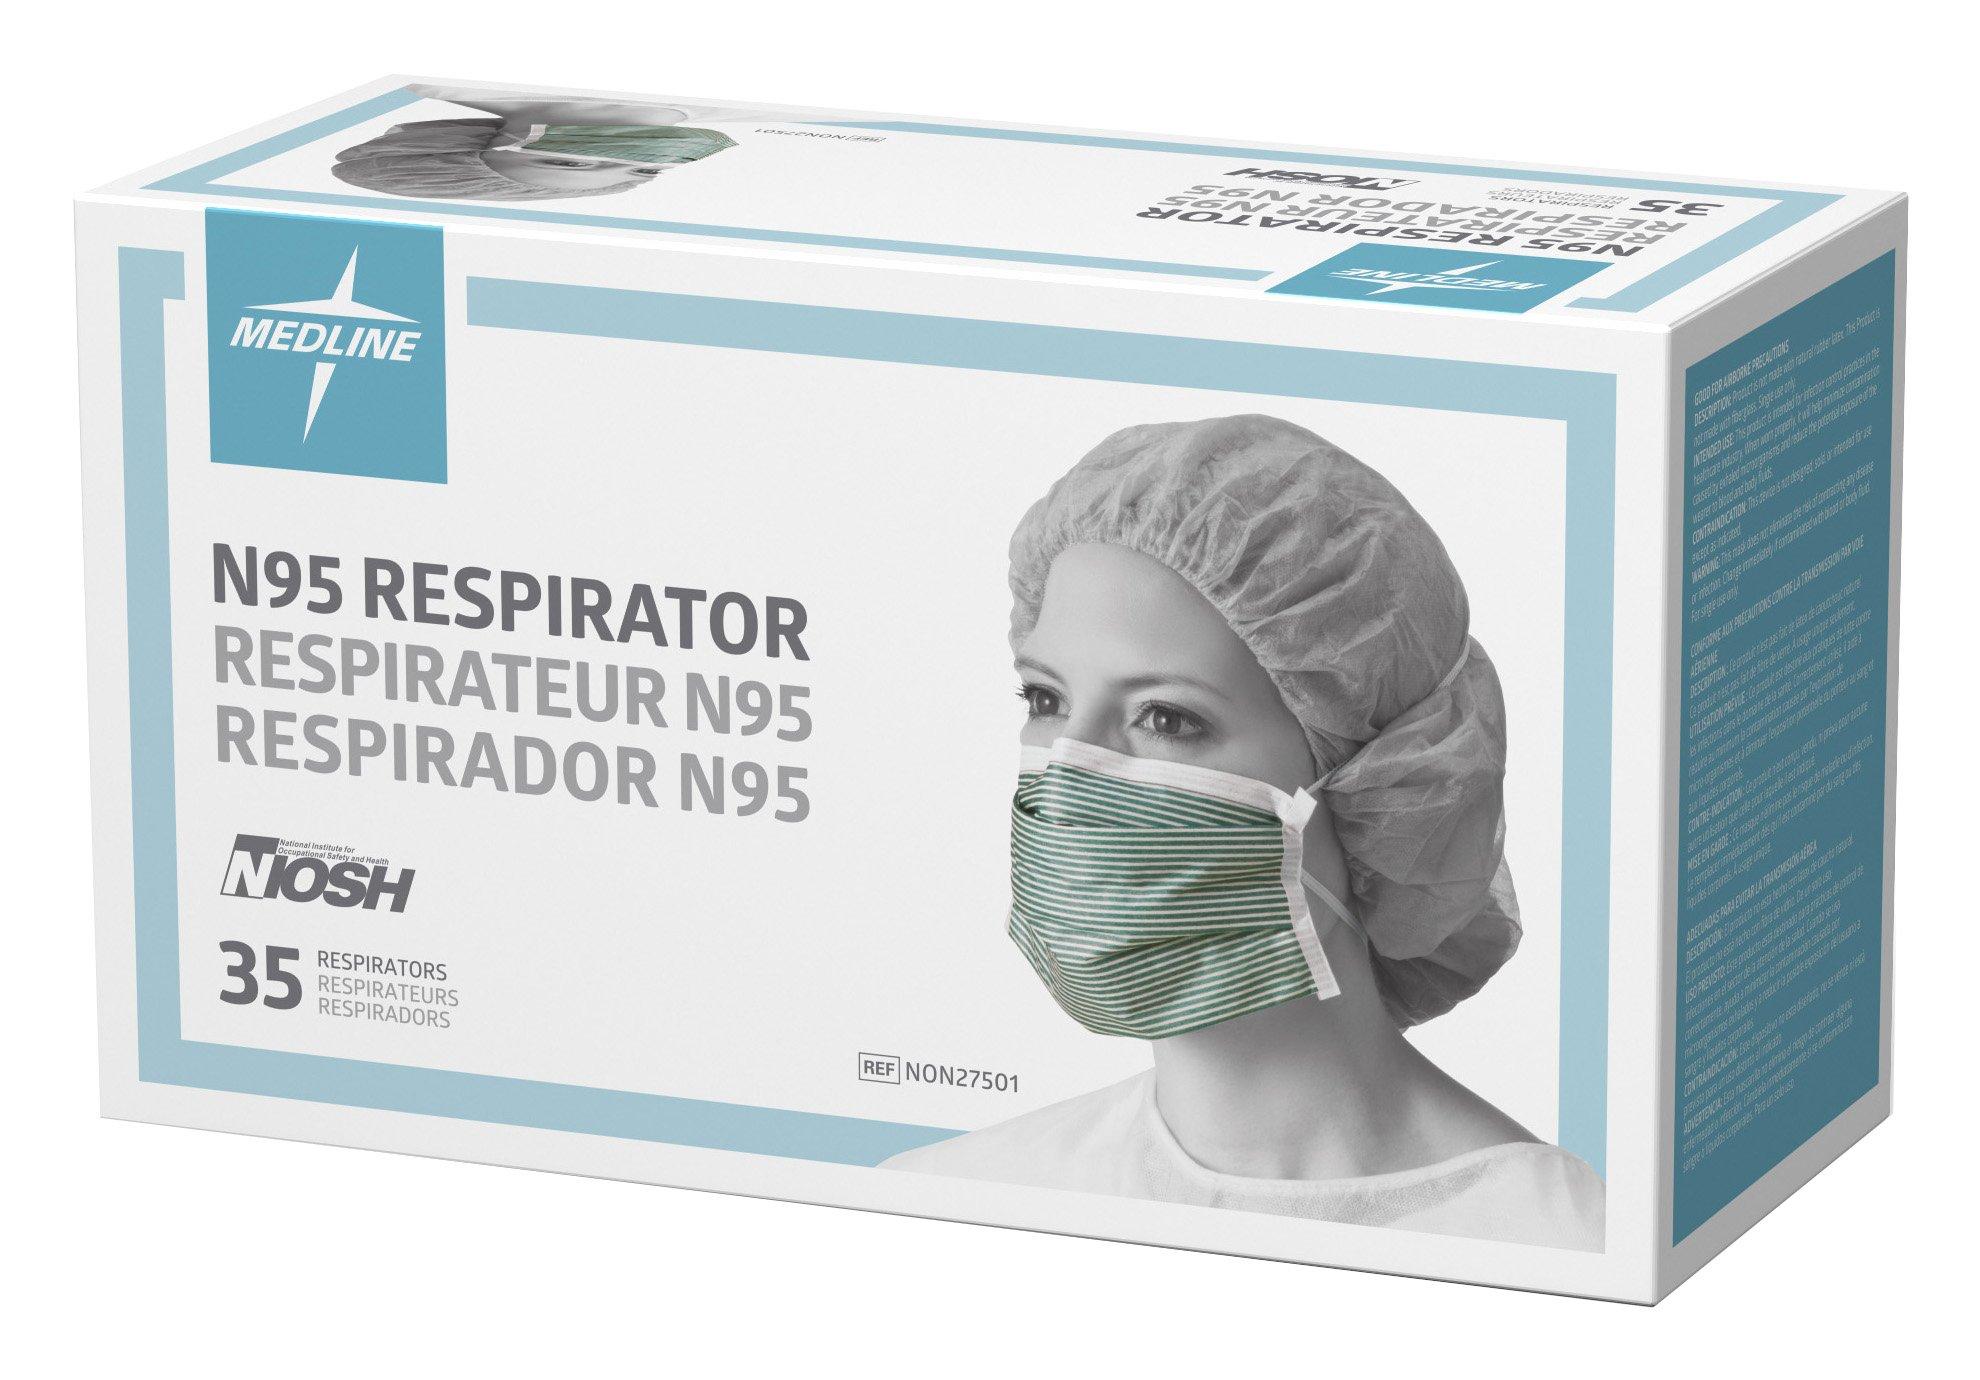 Medline NON27501 N95 Flat Fold Respirator Masks, Cellulose, Latex Free, White/Green (Pack of 210) by Medline (Image #4)